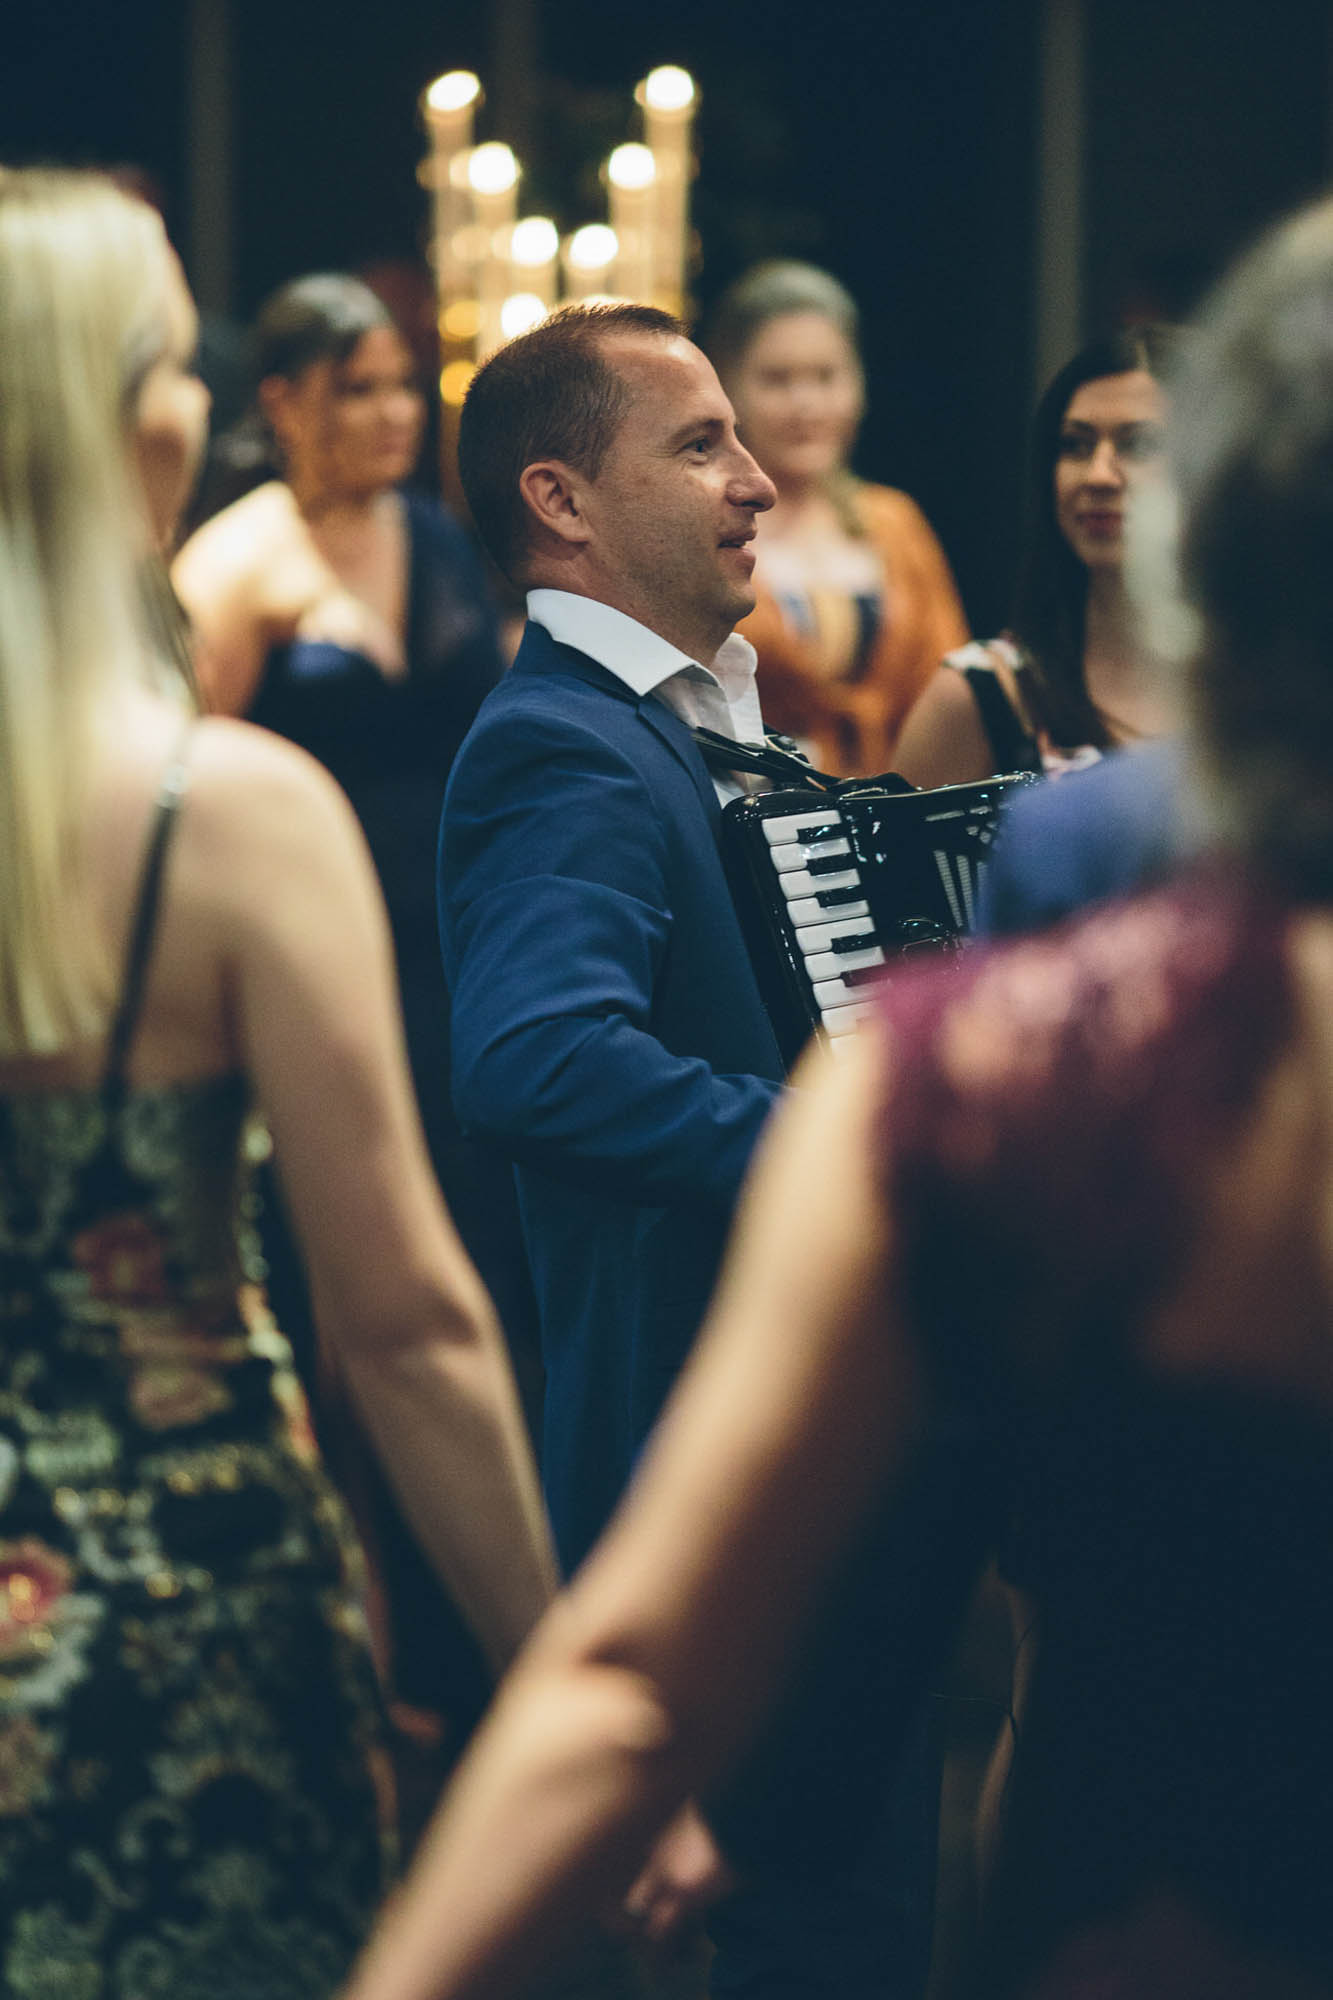 MacDougall-Photography-Sydney-Wedding-Photographers-85.jpg